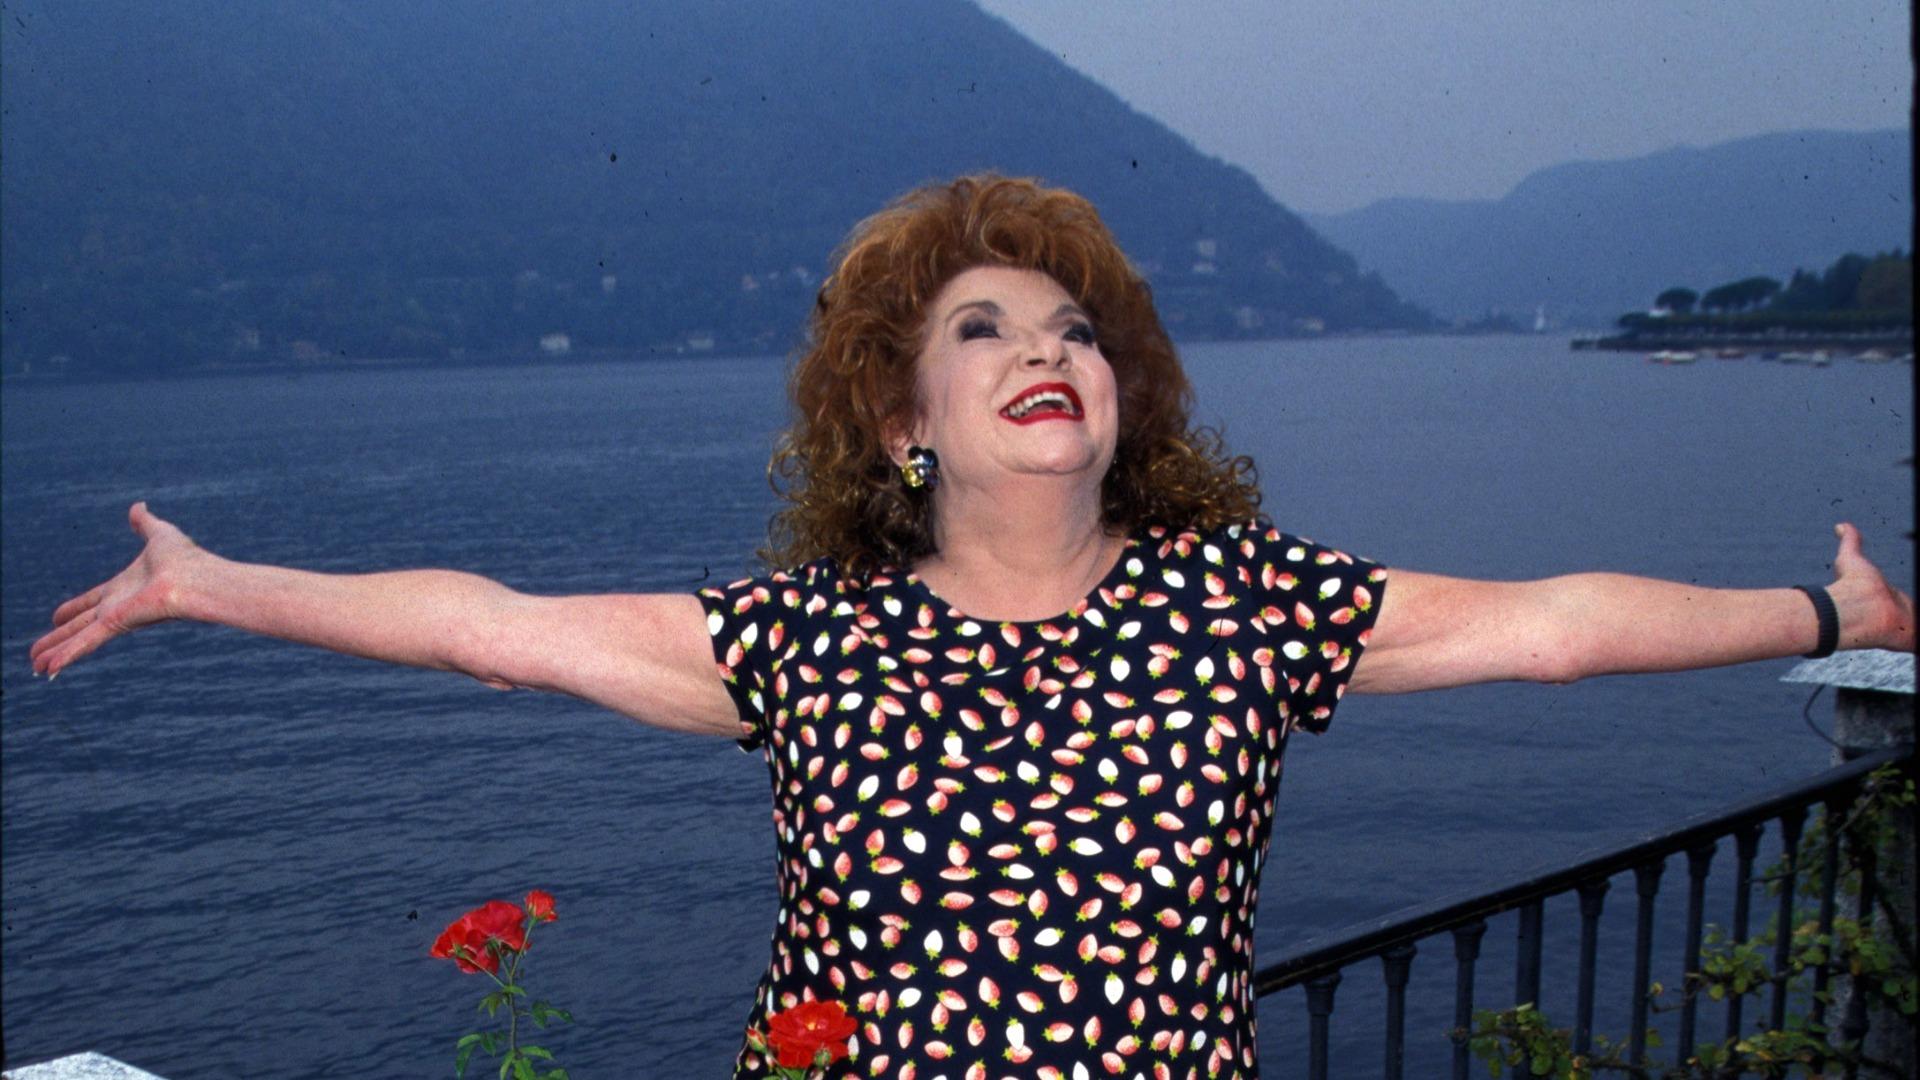 The late Darlene Conley drank in the beautiful weather in Lake Como, Italy.